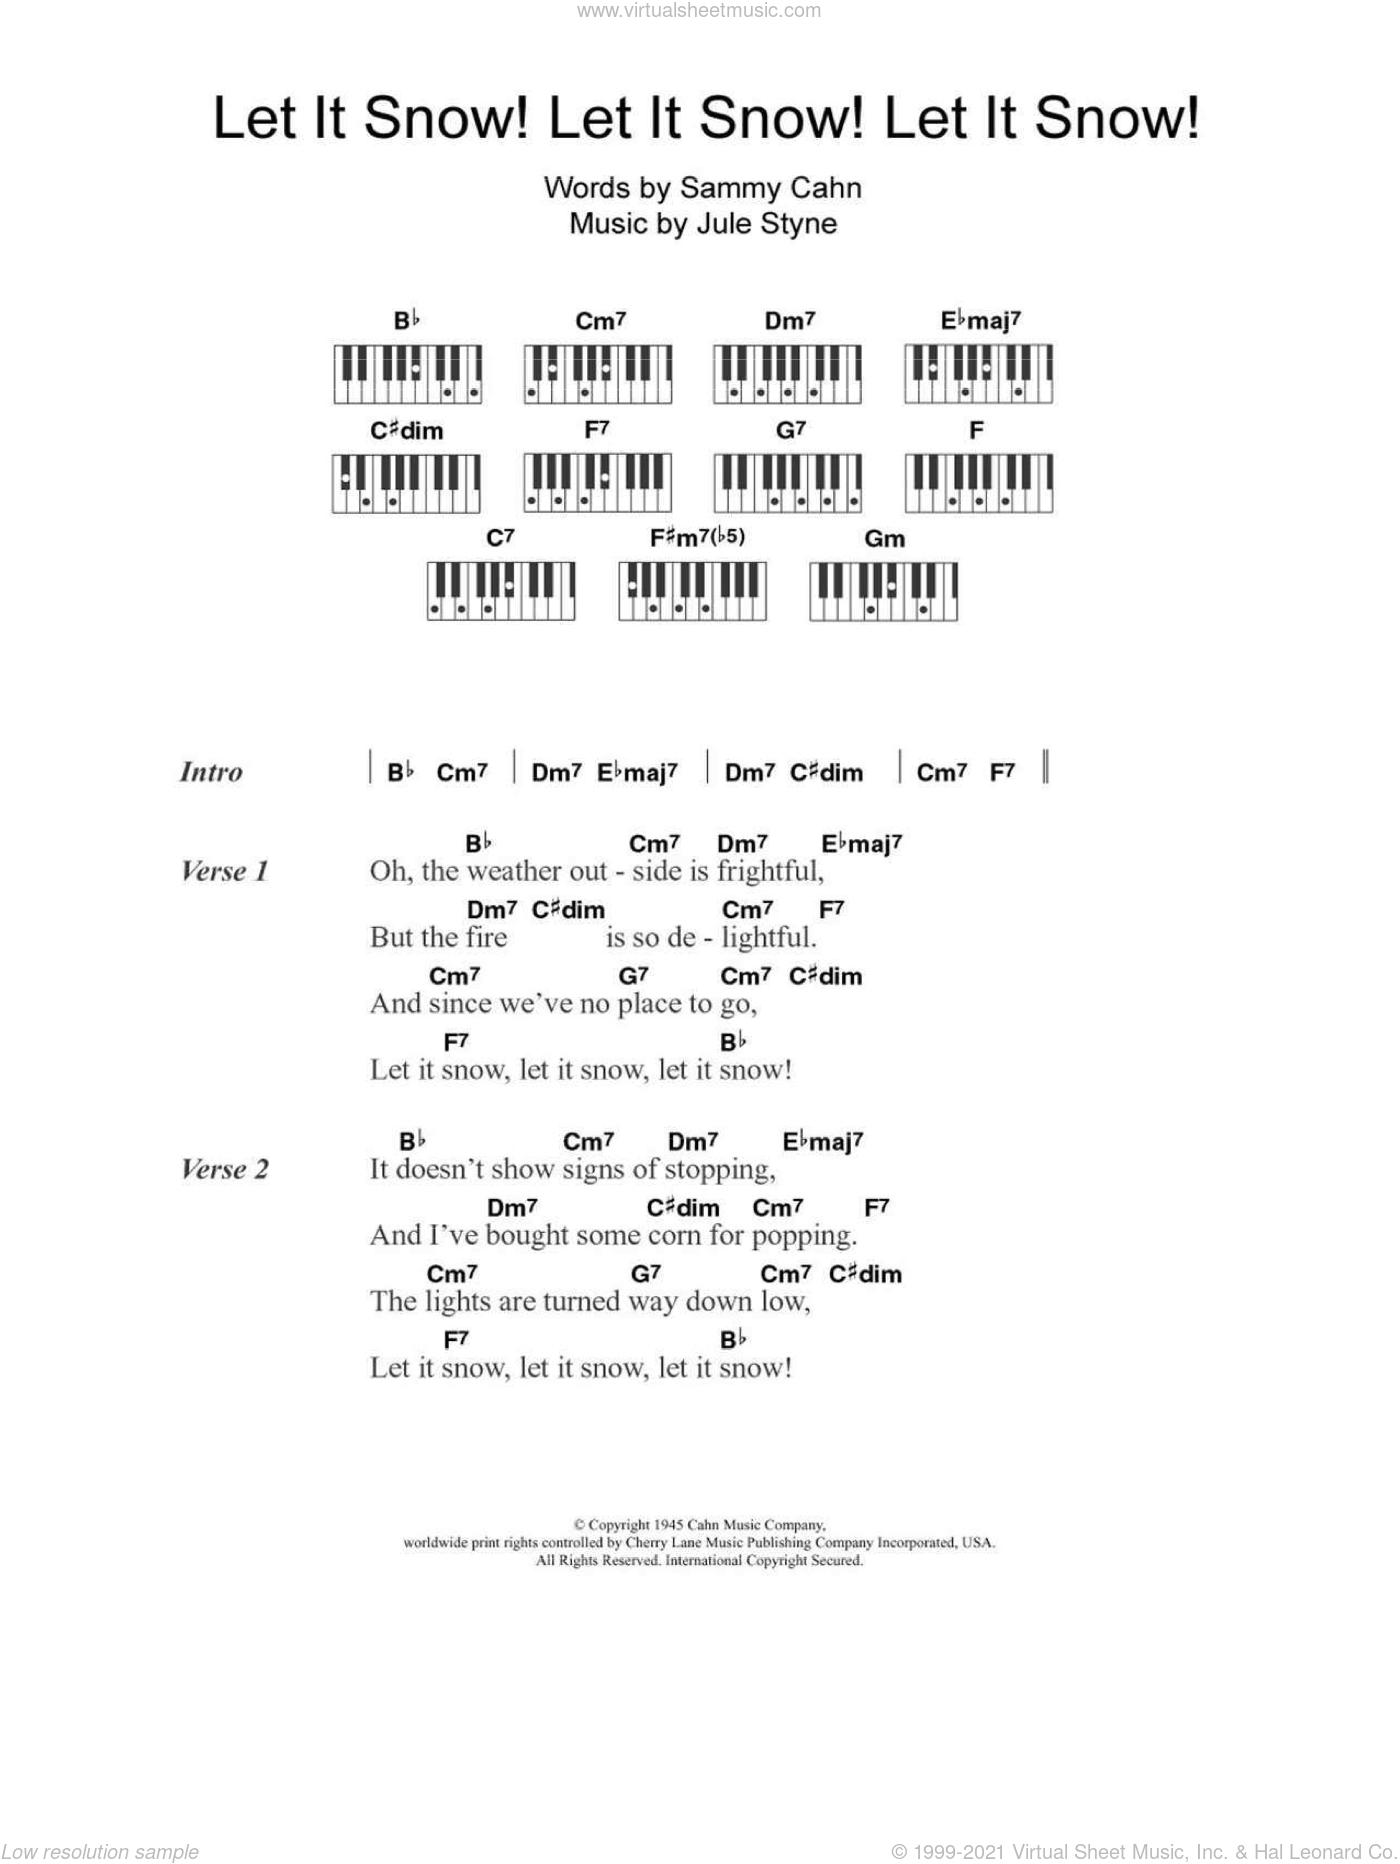 Let It Snow! Let It Snow! Let It Snow! sheet music for piano solo (chords, lyrics, melody) by Doris Day, Jule Styne and Sammy Cahn, intermediate piano (chords, lyrics, melody)